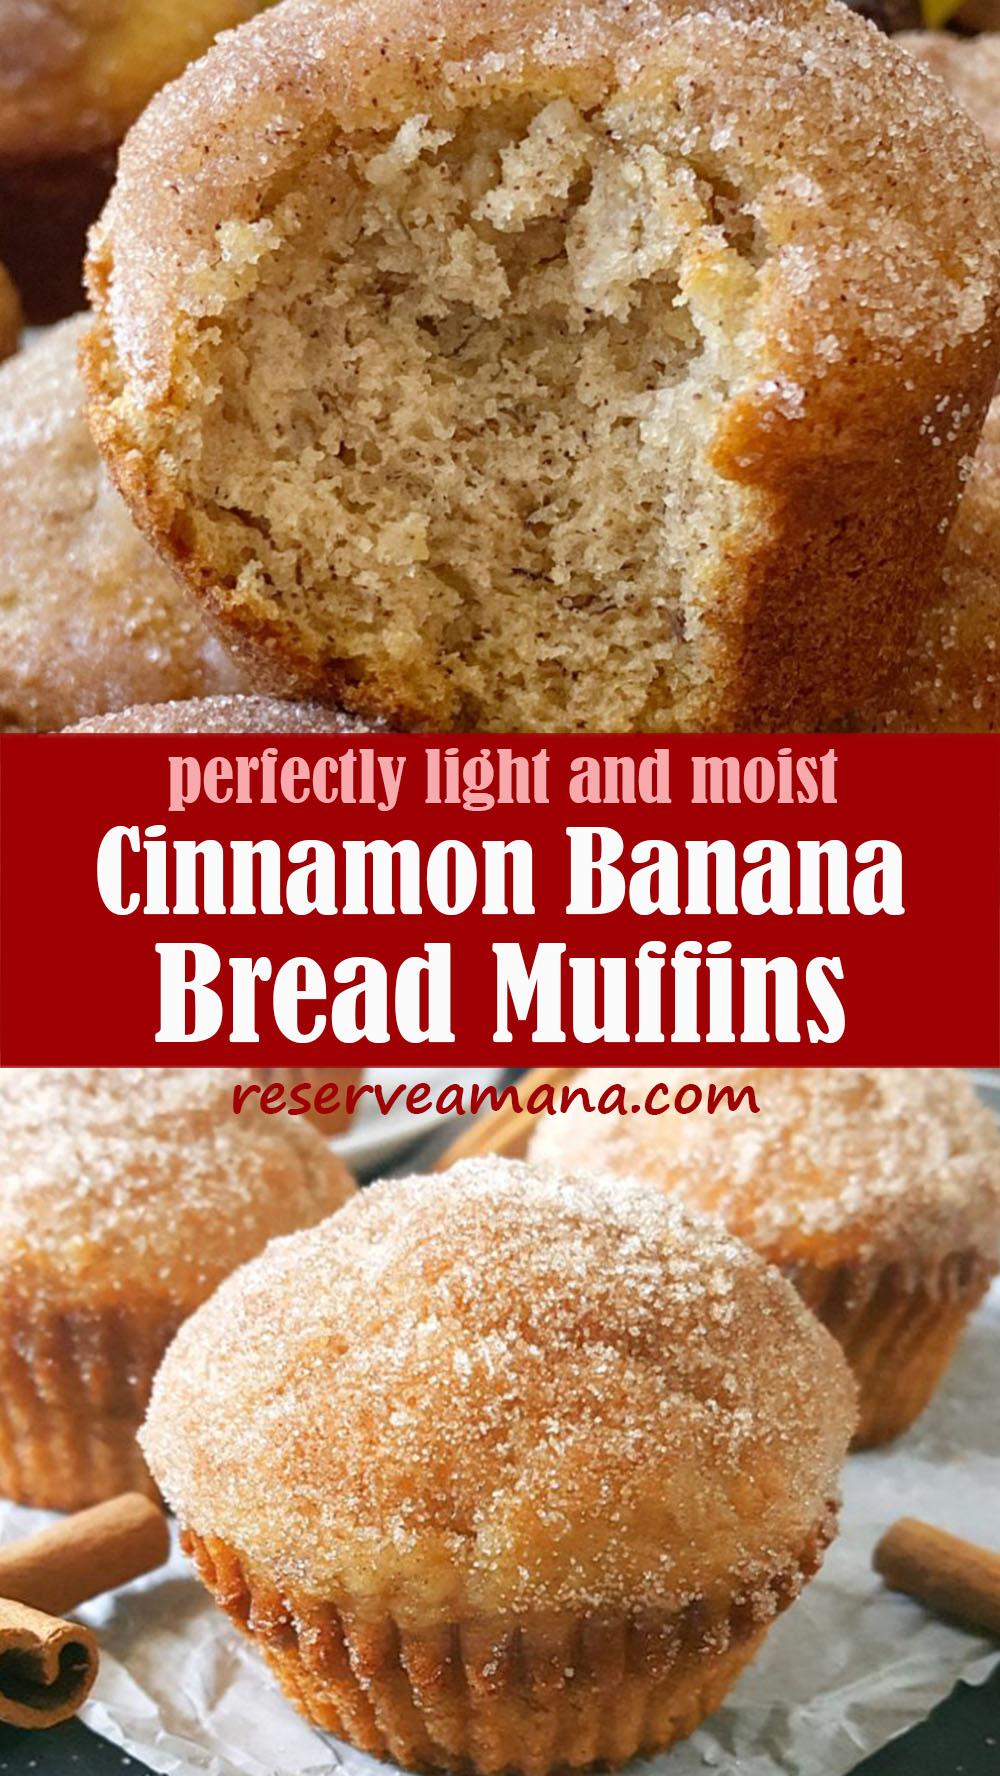 Easy Cinnamon Banana Bread Muffins